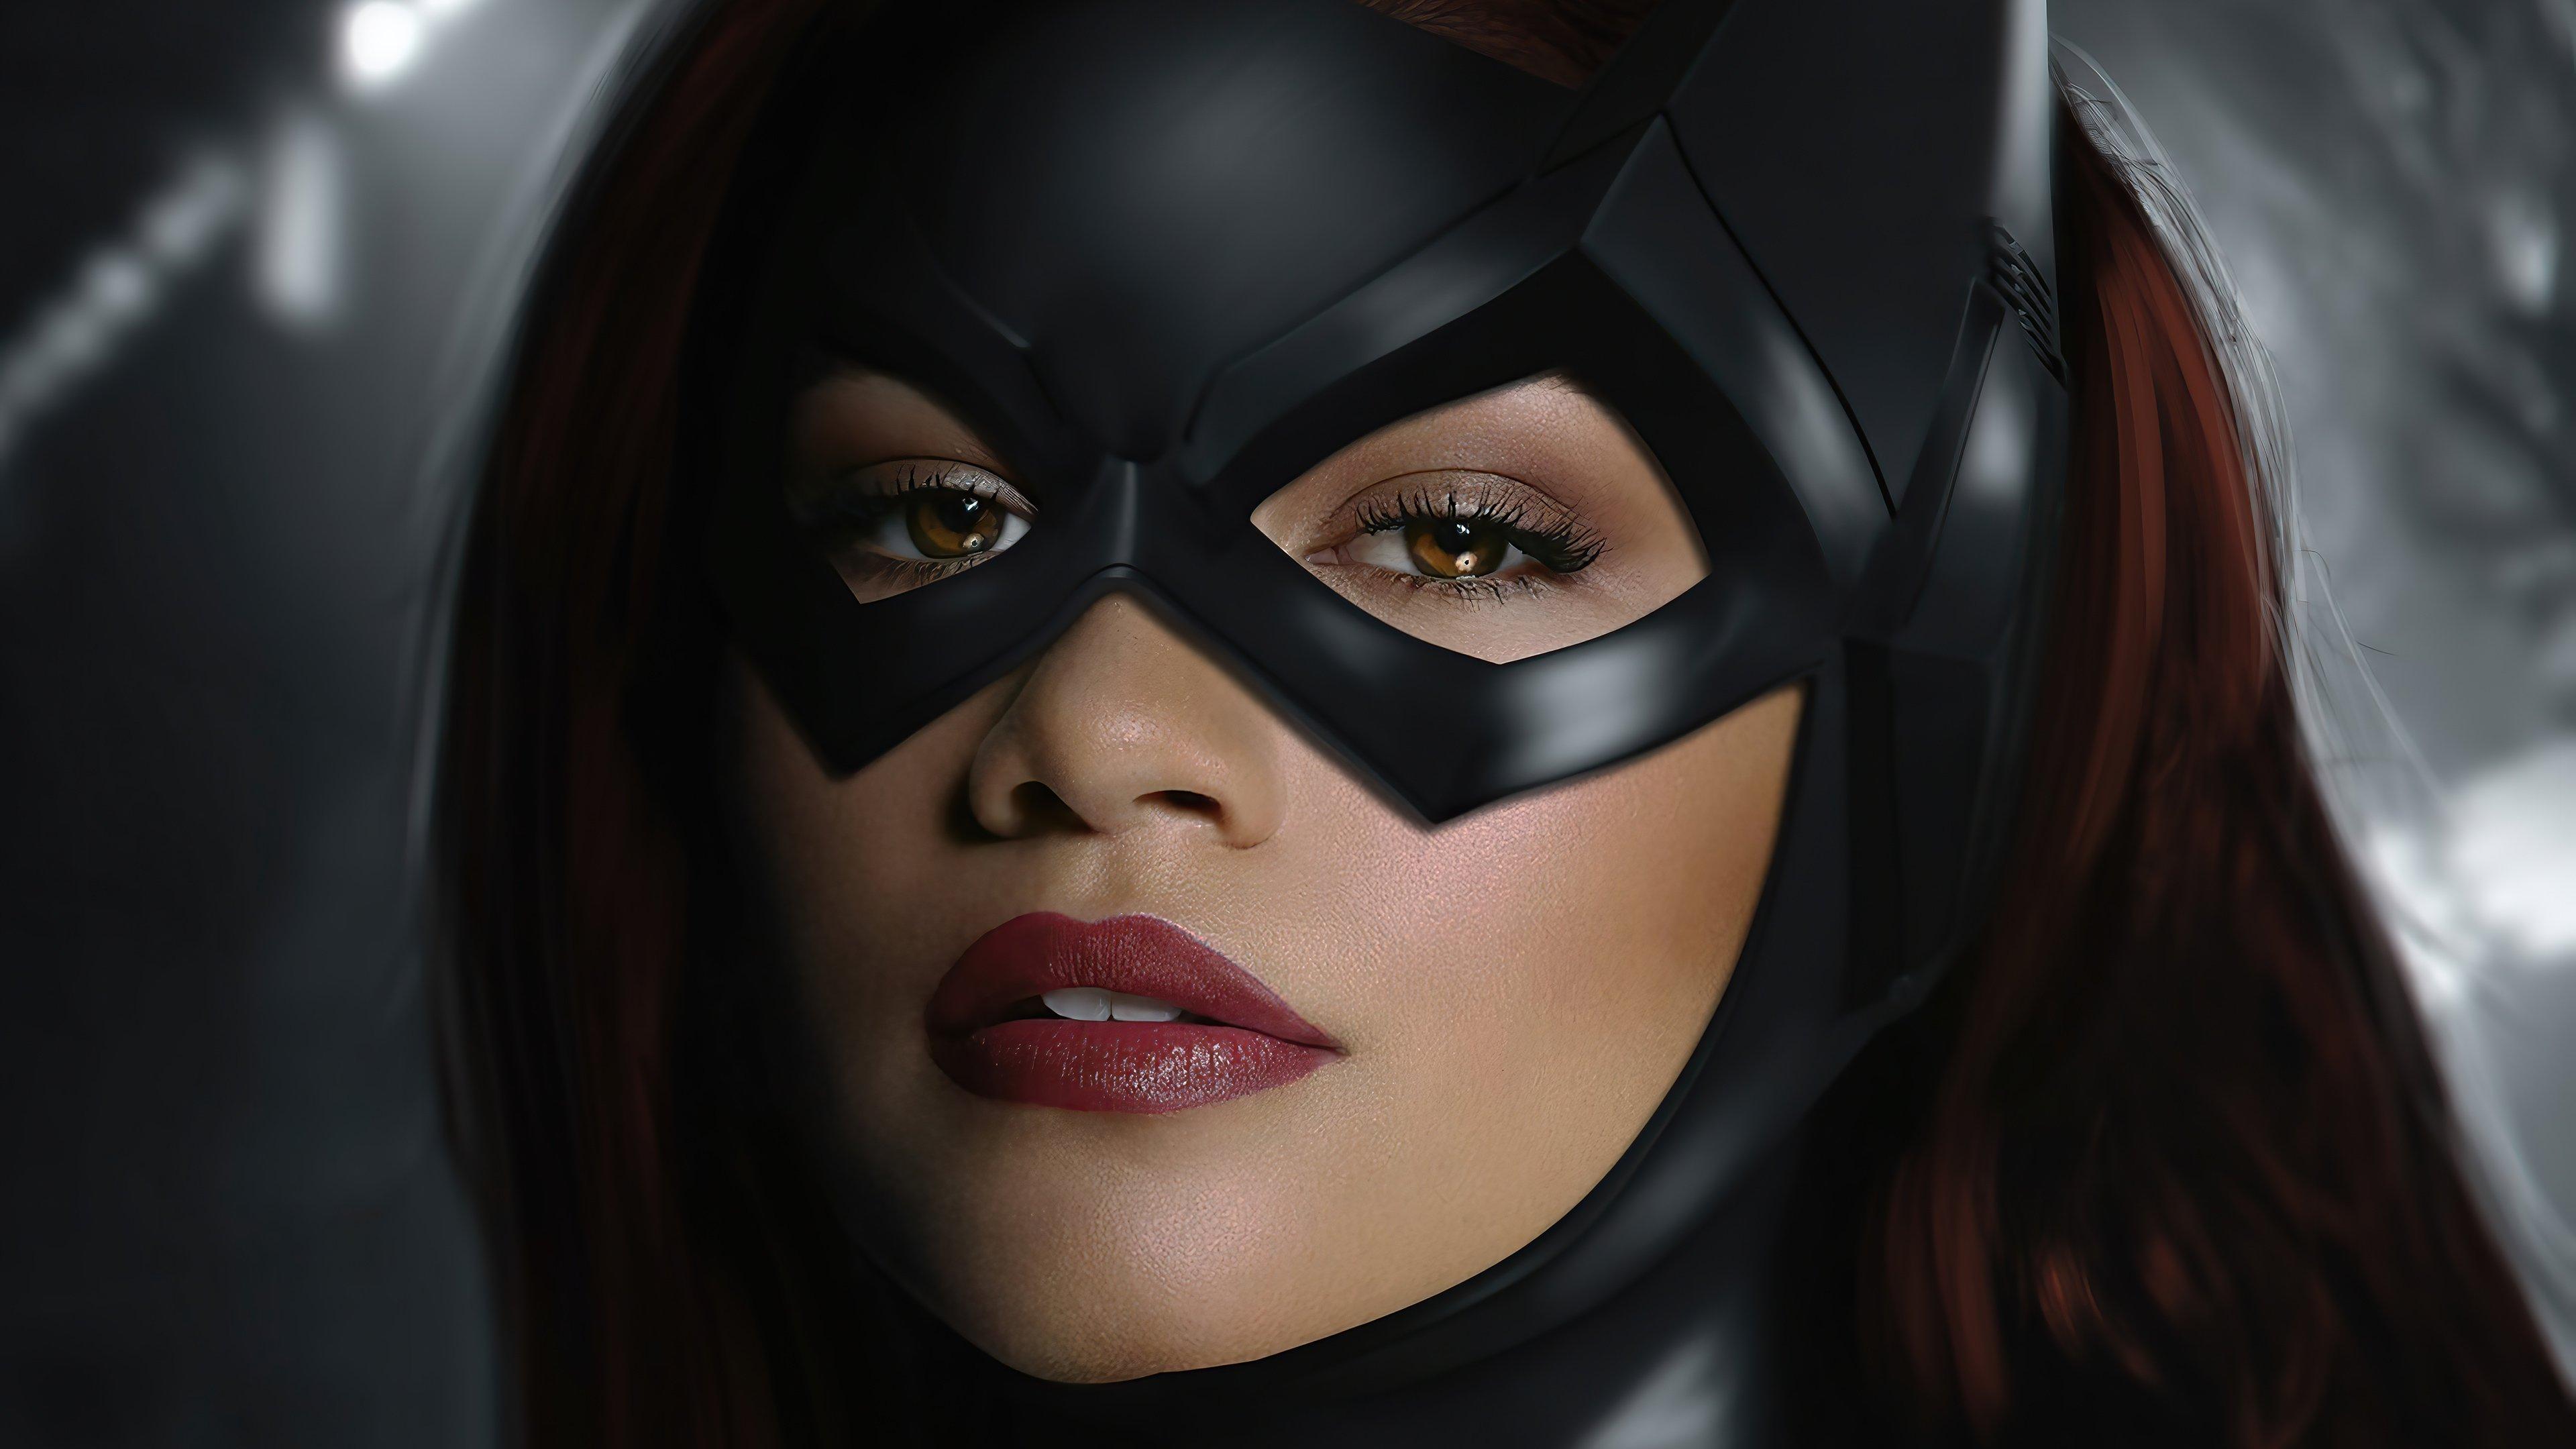 Wallpaper Zendaya as Batgirl